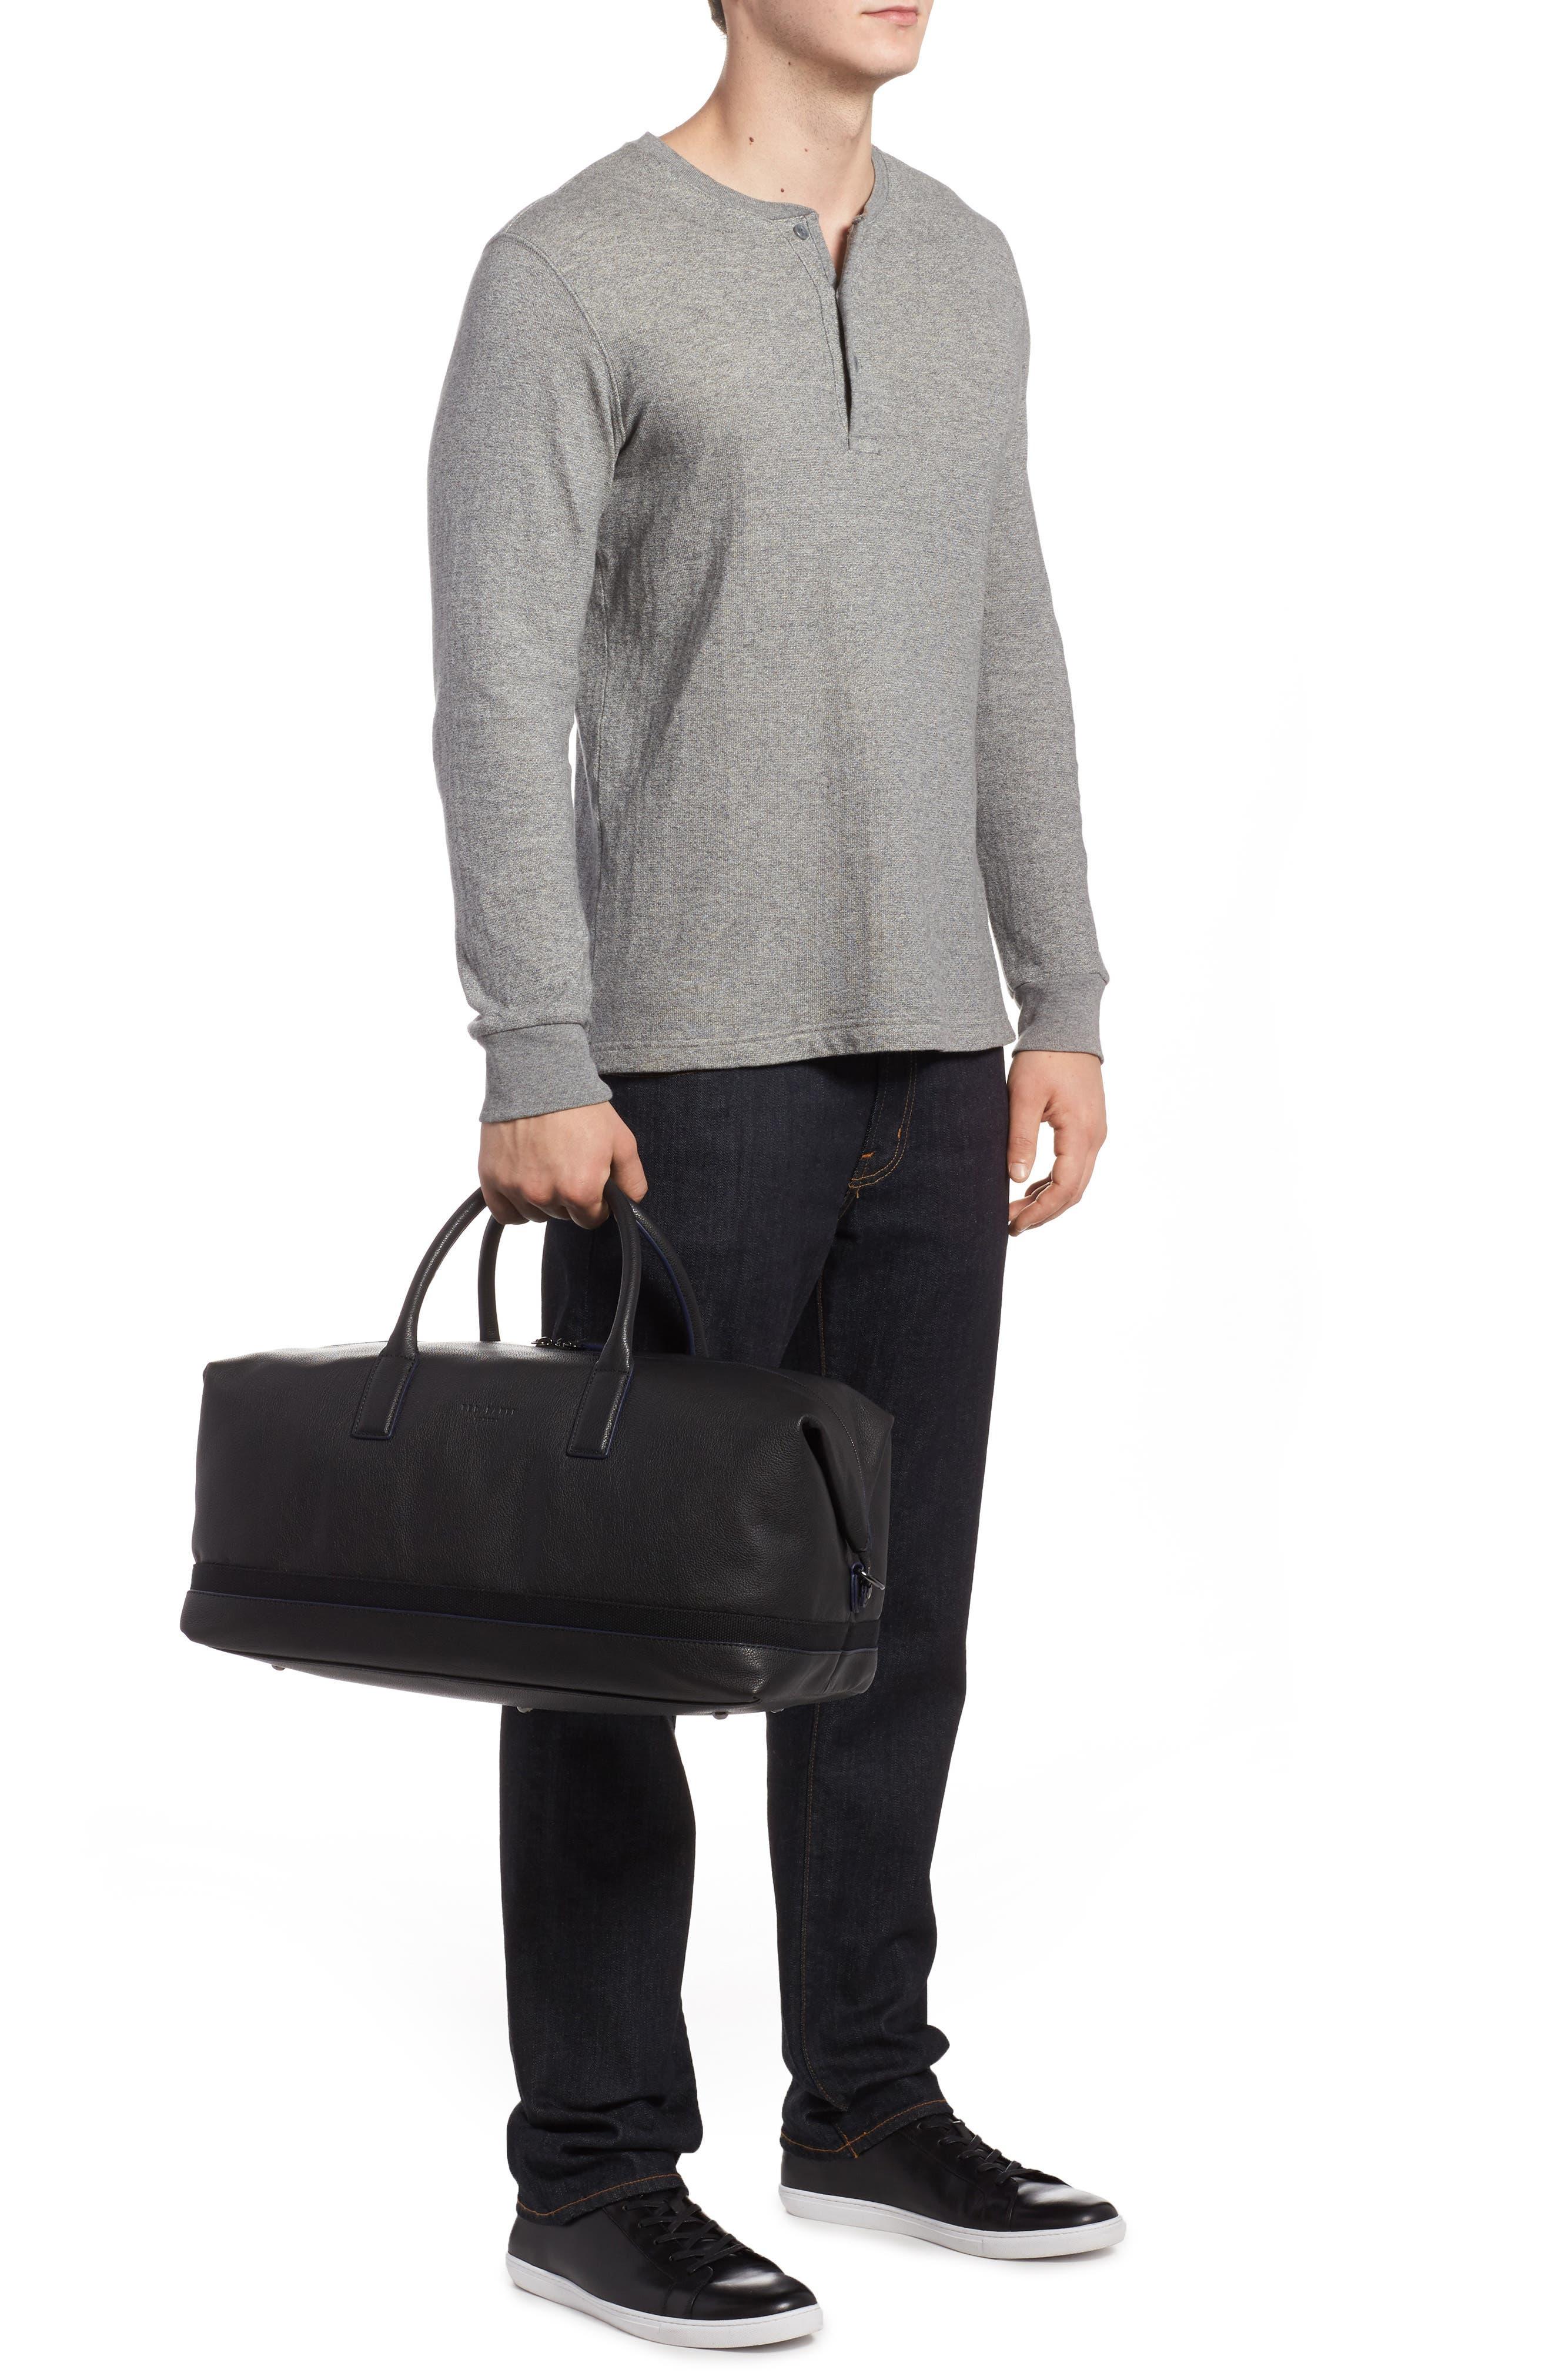 Mylow Duffel Bag,                             Alternate thumbnail 2, color,                             Black